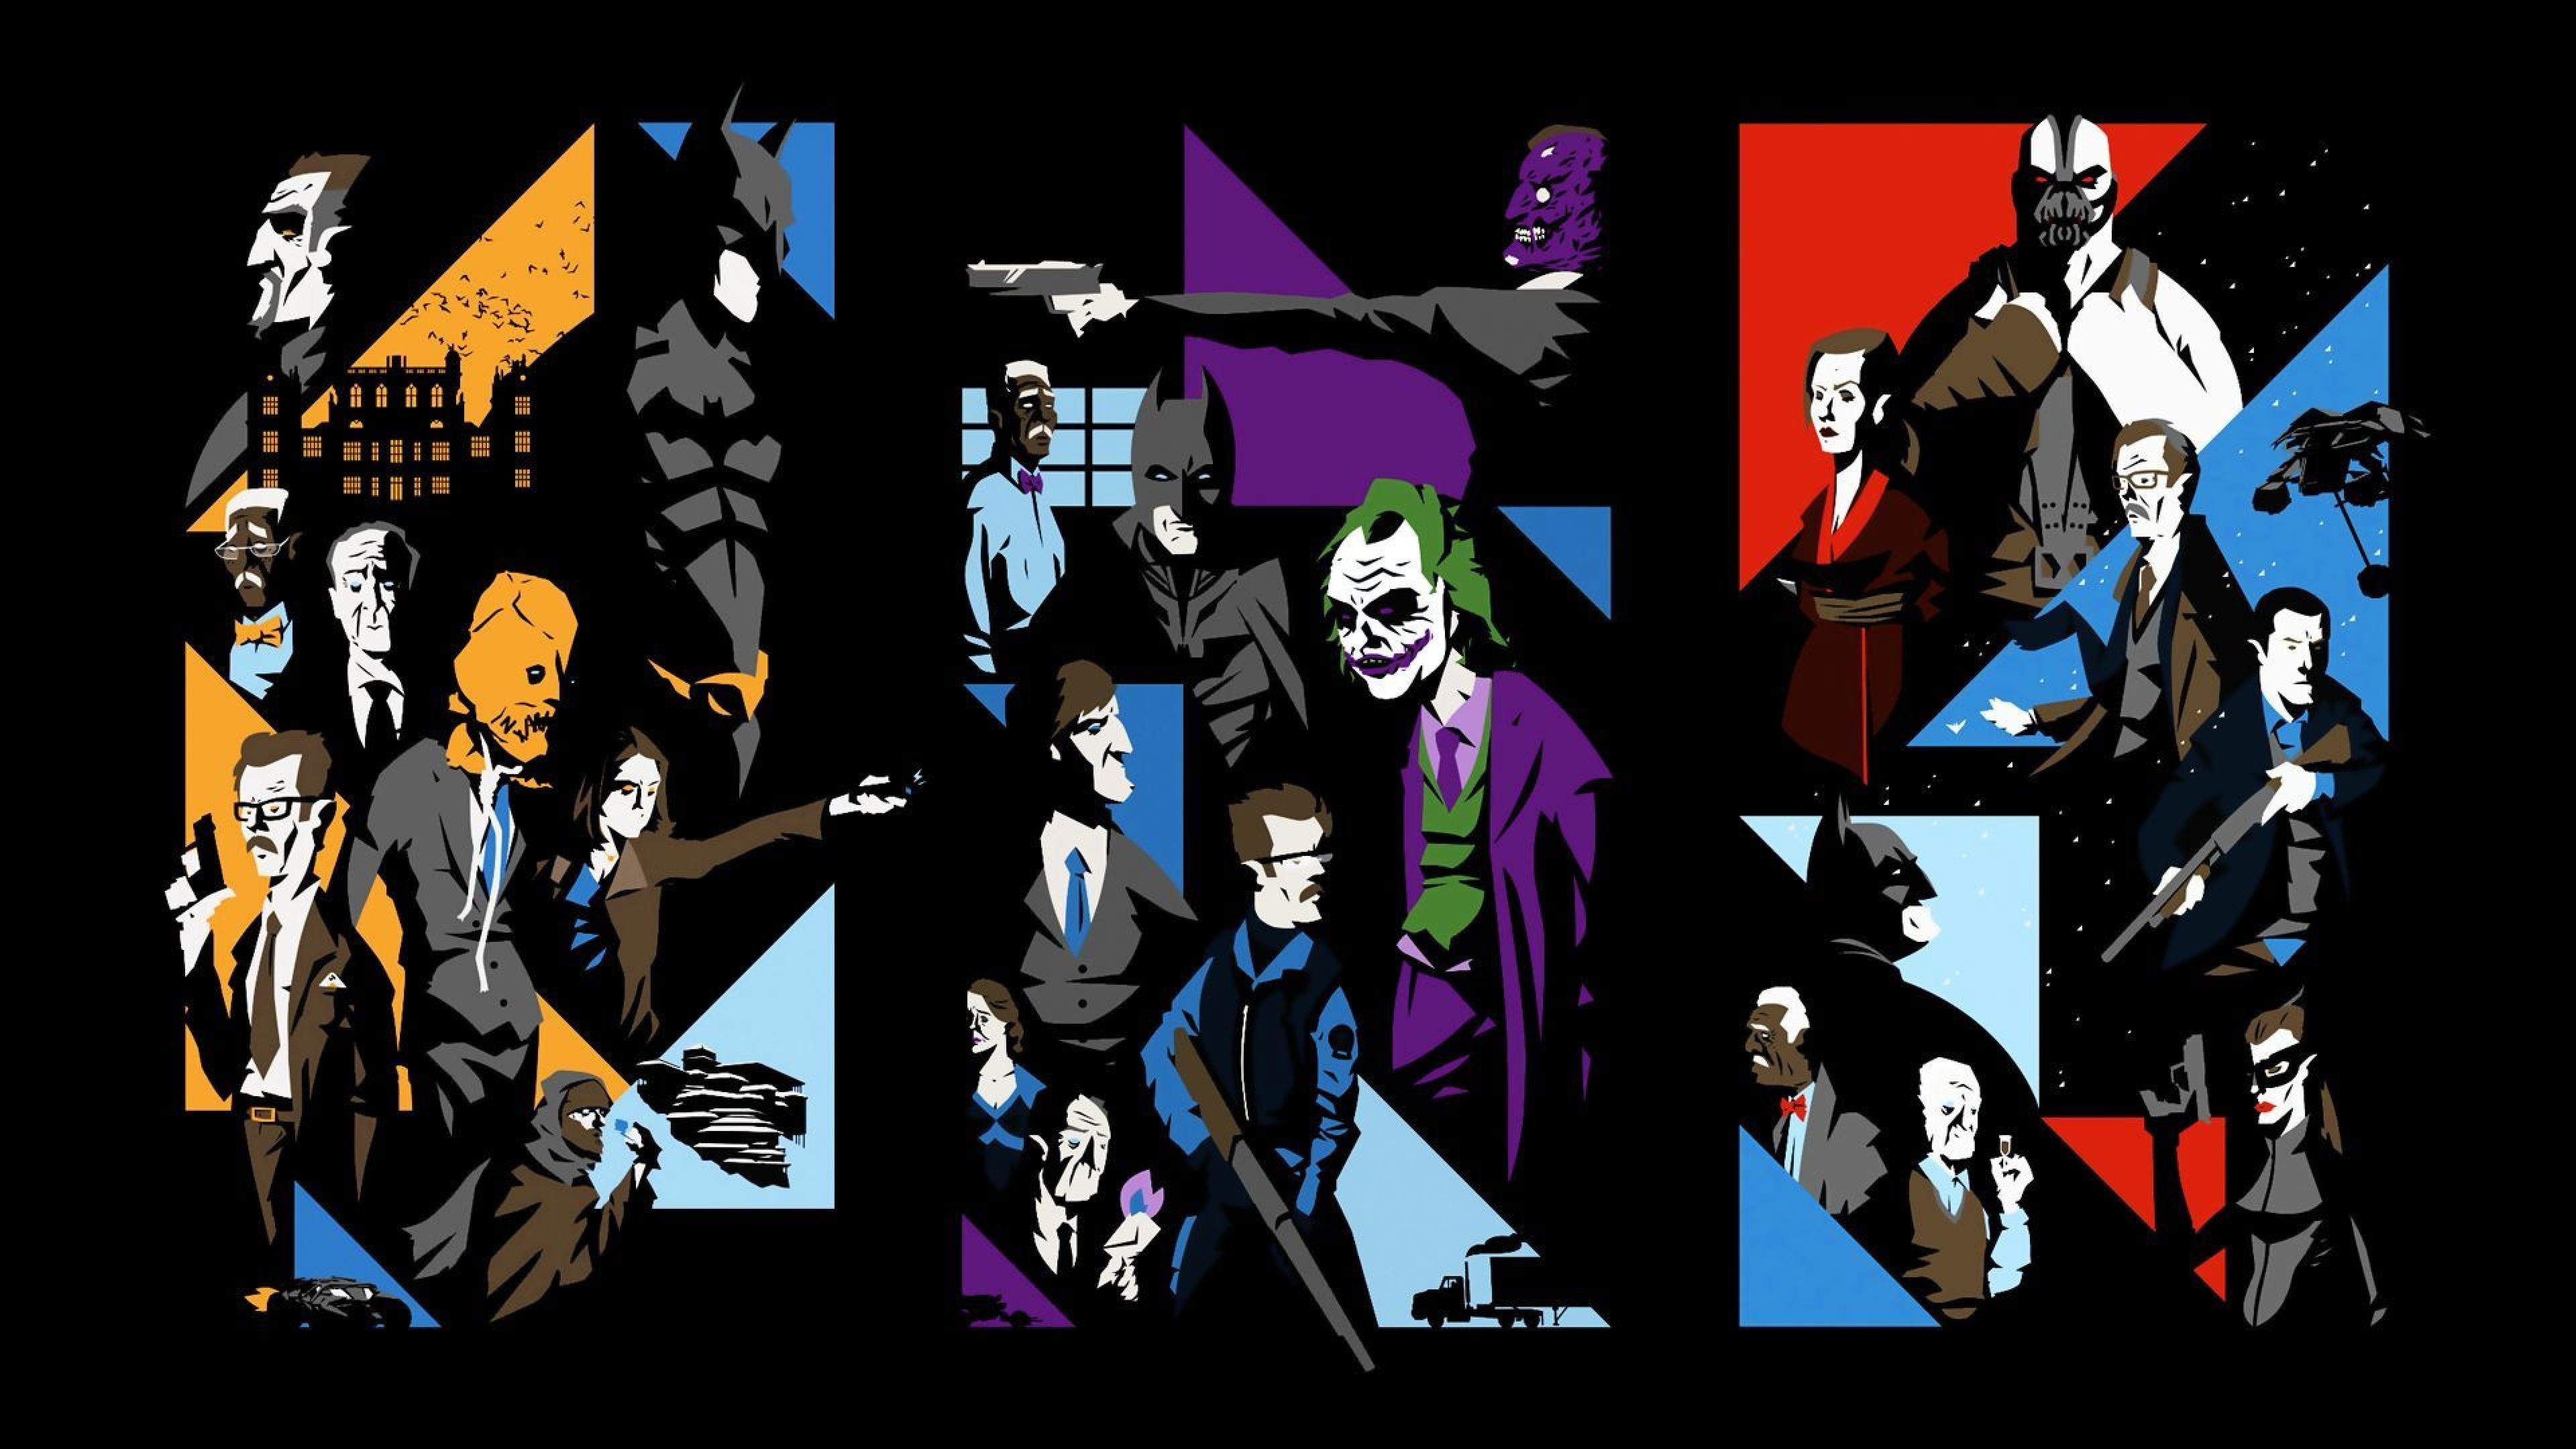 Wallpaper the dark knight, the dark knight rises, batman begins,  characters,